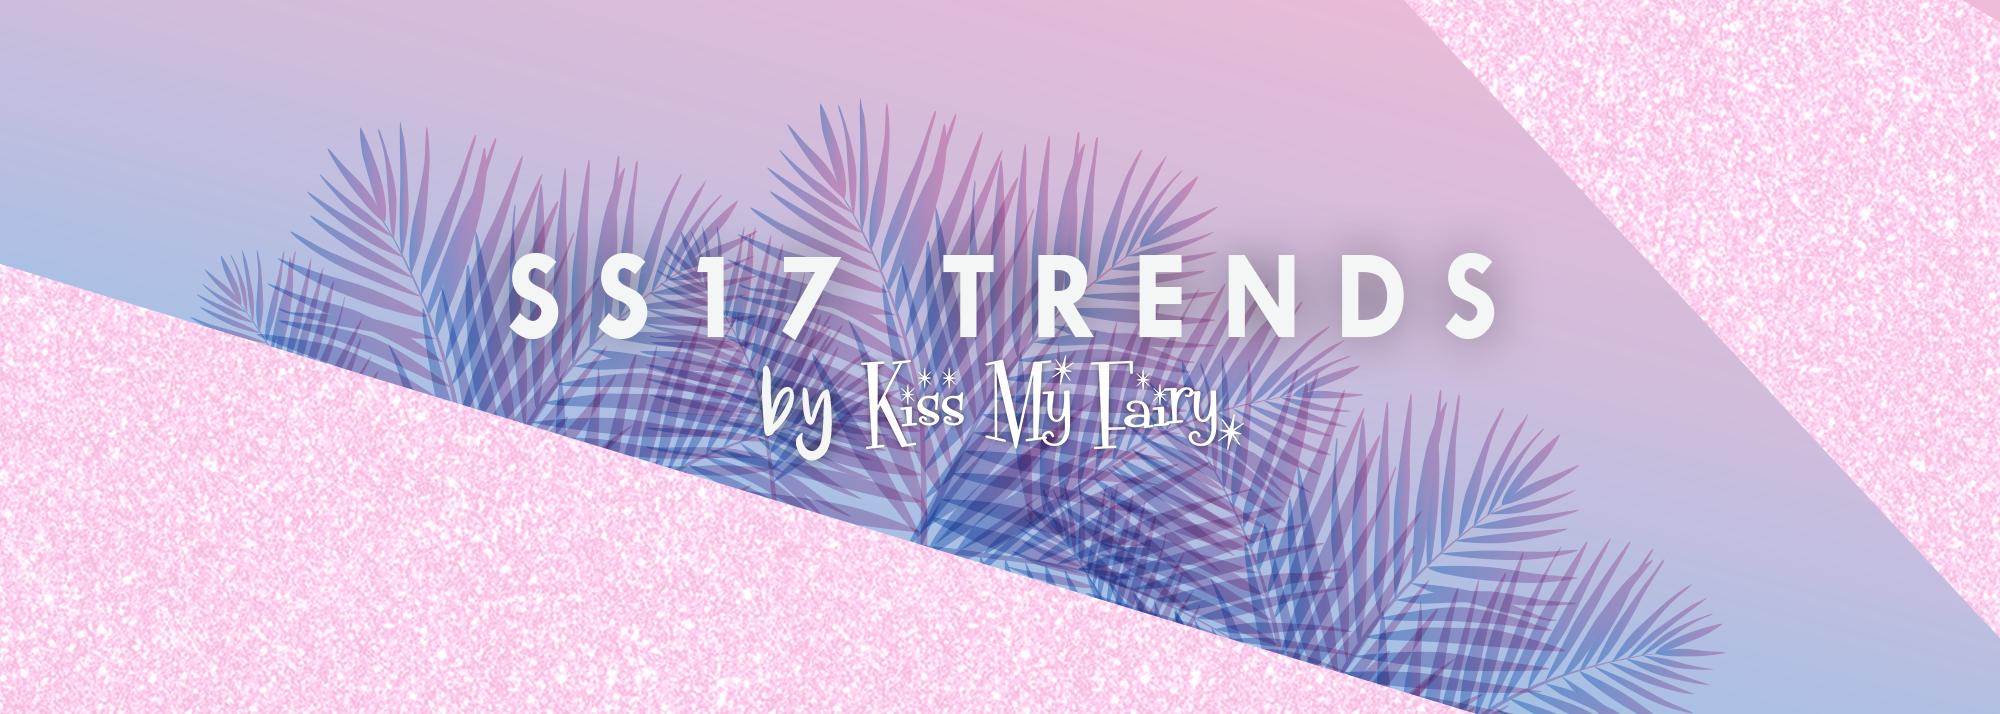 Kiss My Fairy's SS17 Beauty Trends!